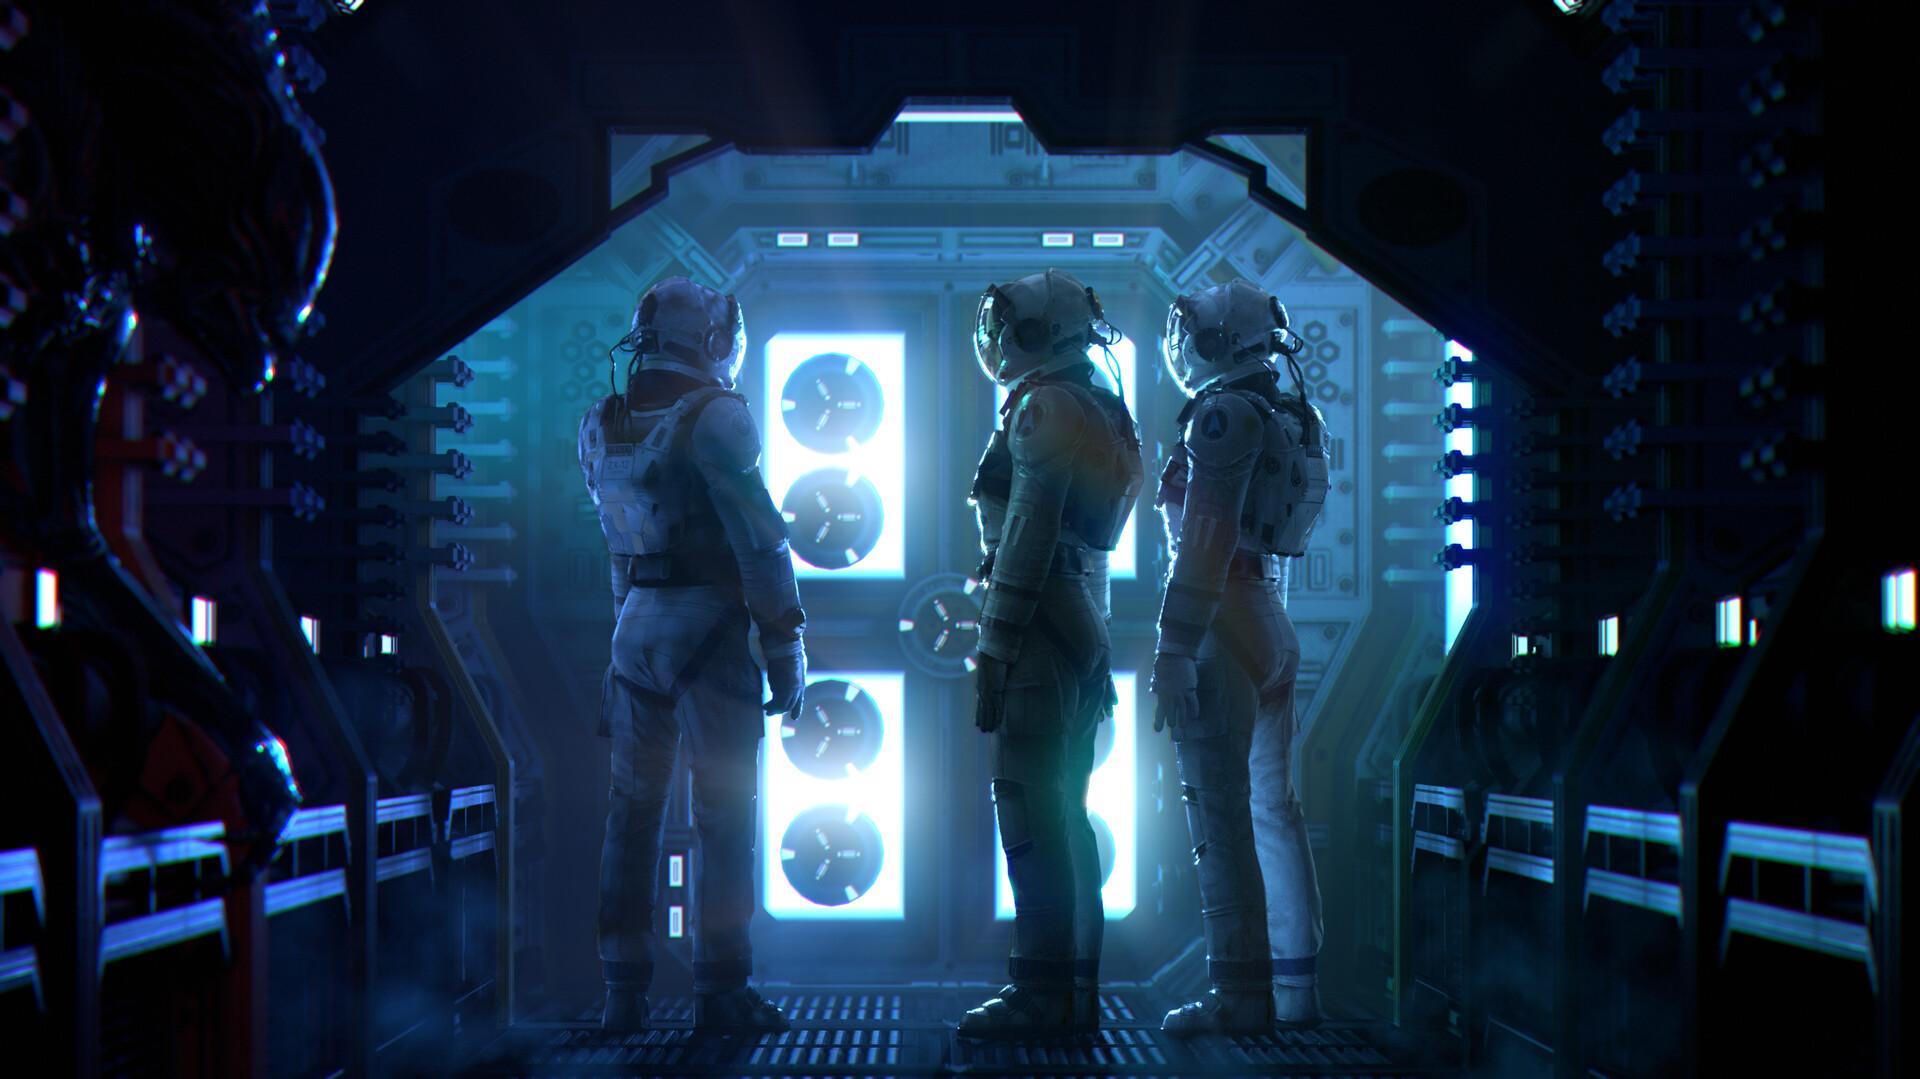 Space Walk - Lighting Demo